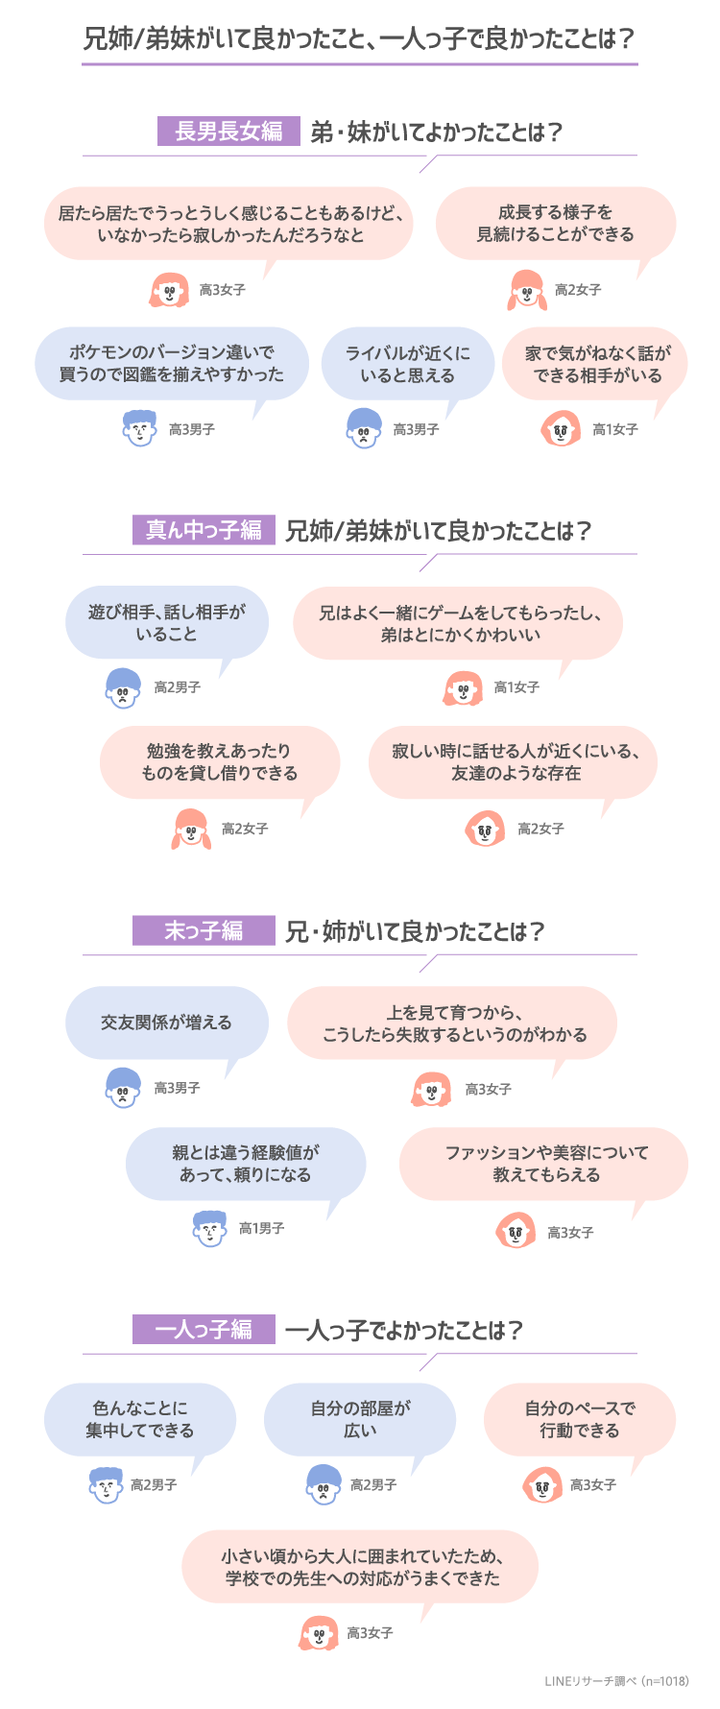 graph_4 (1)